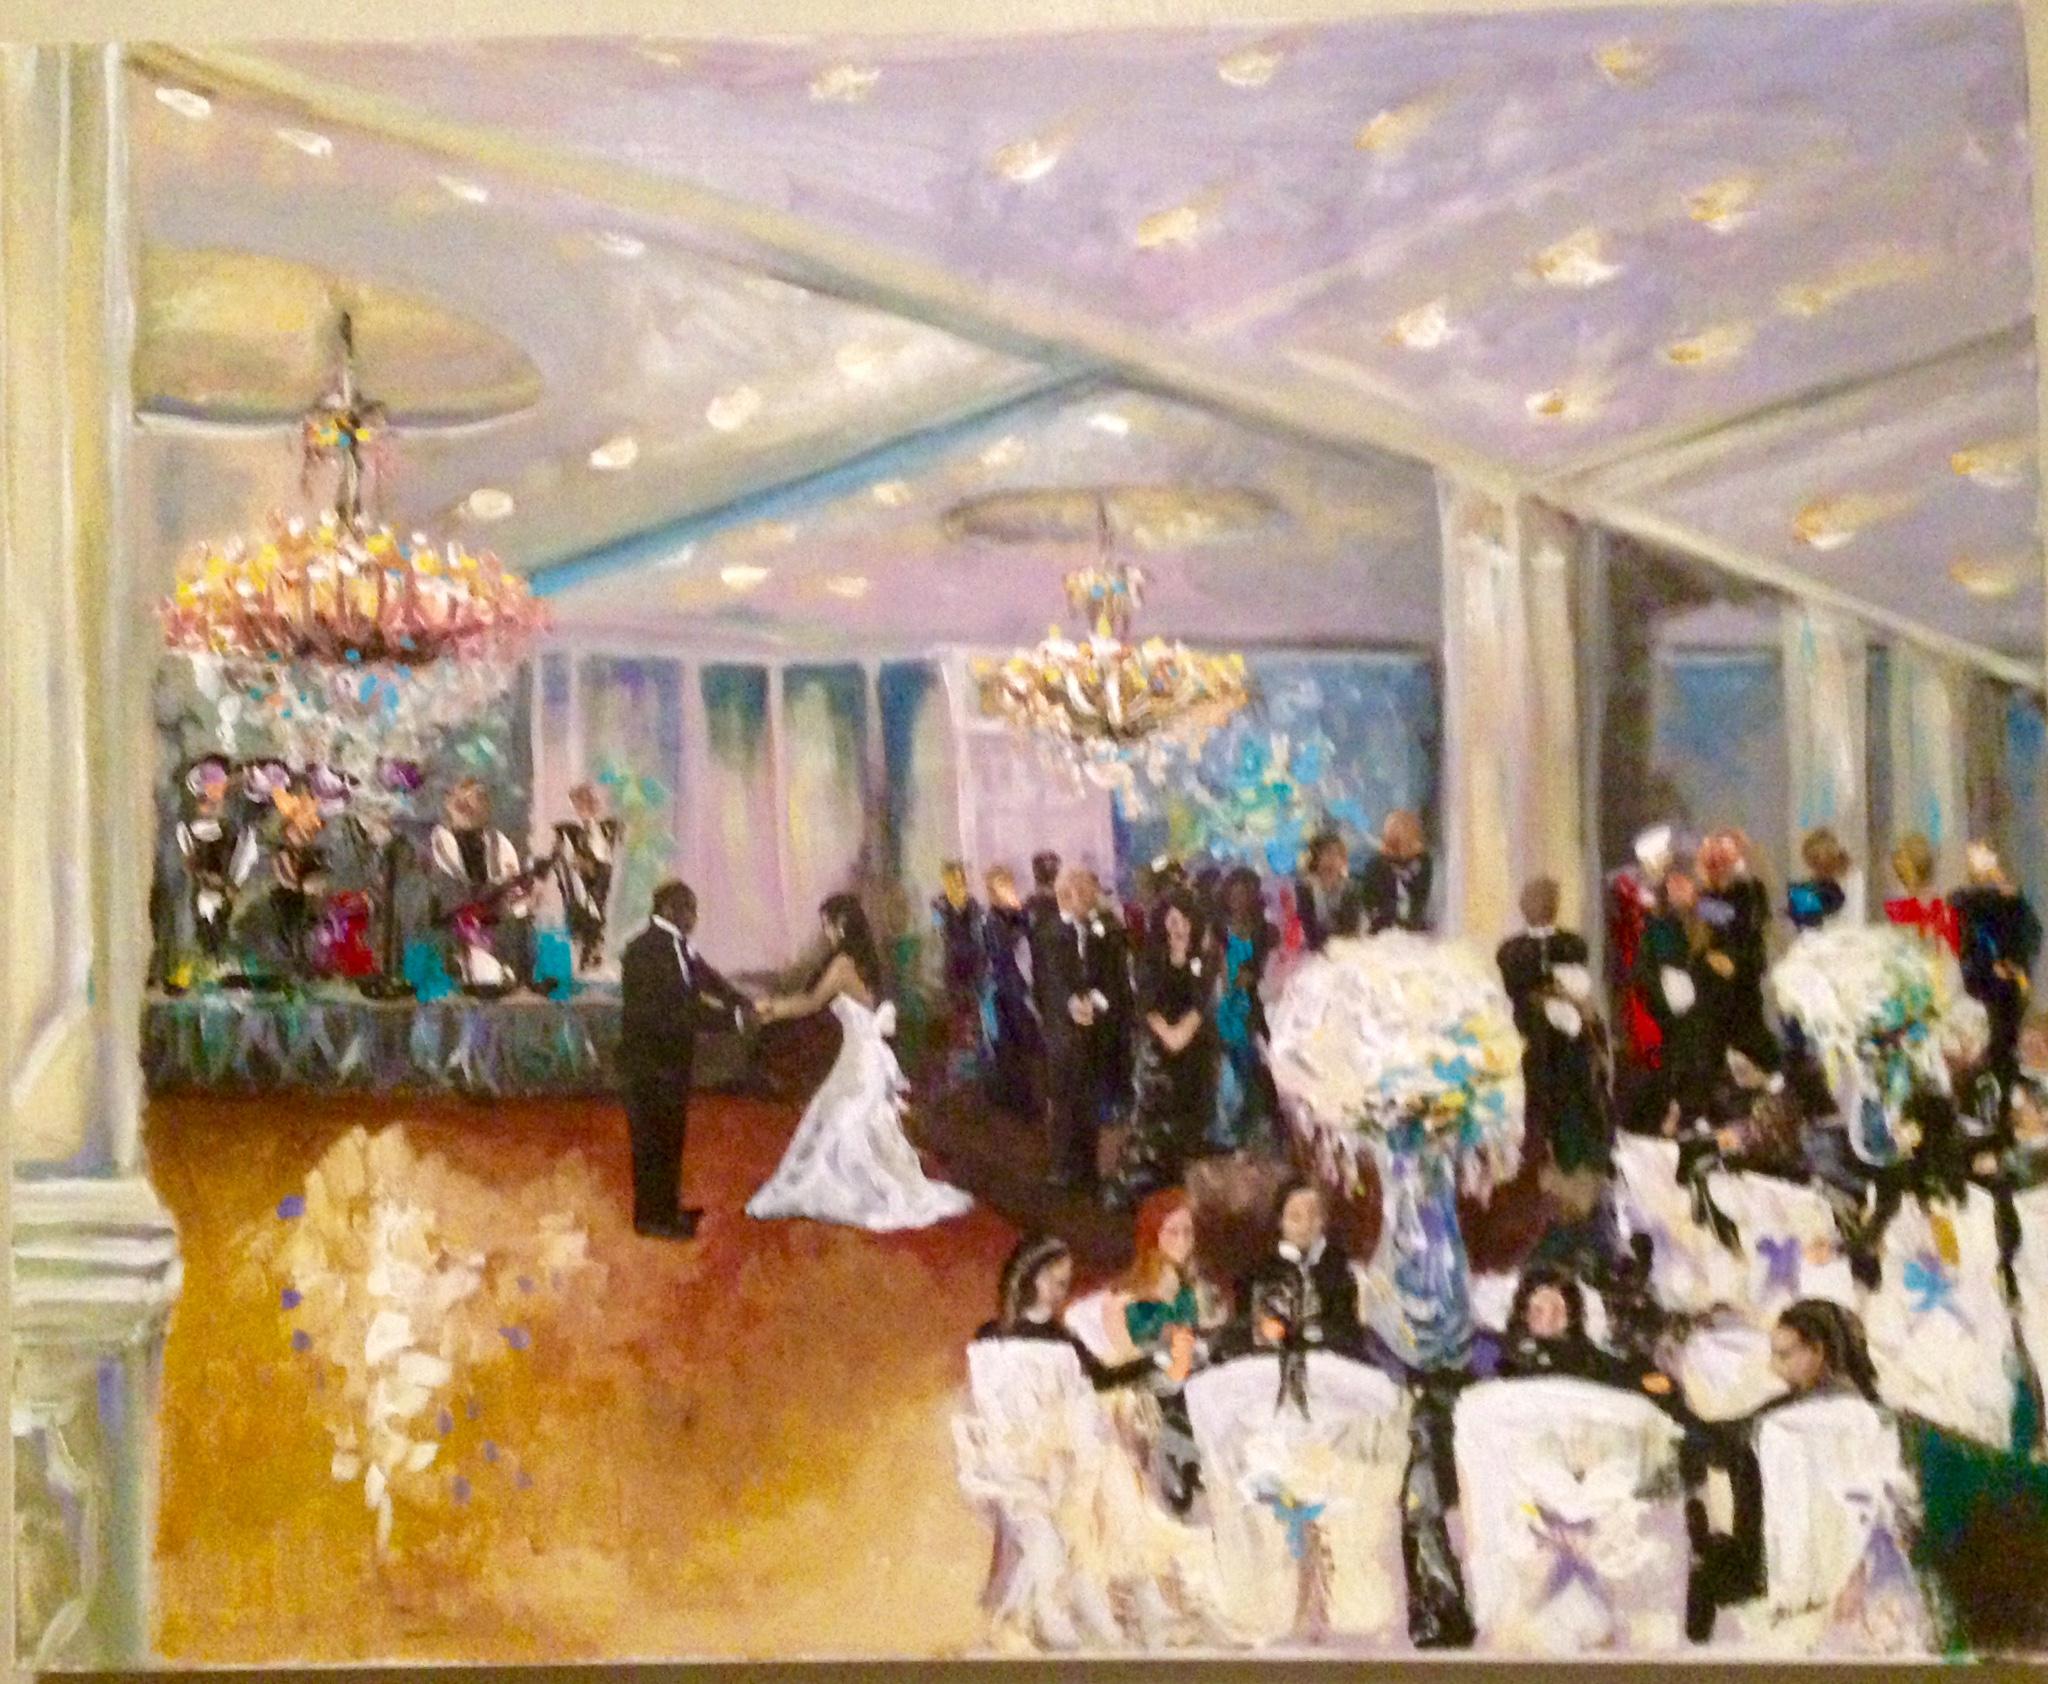 laplace live event painting